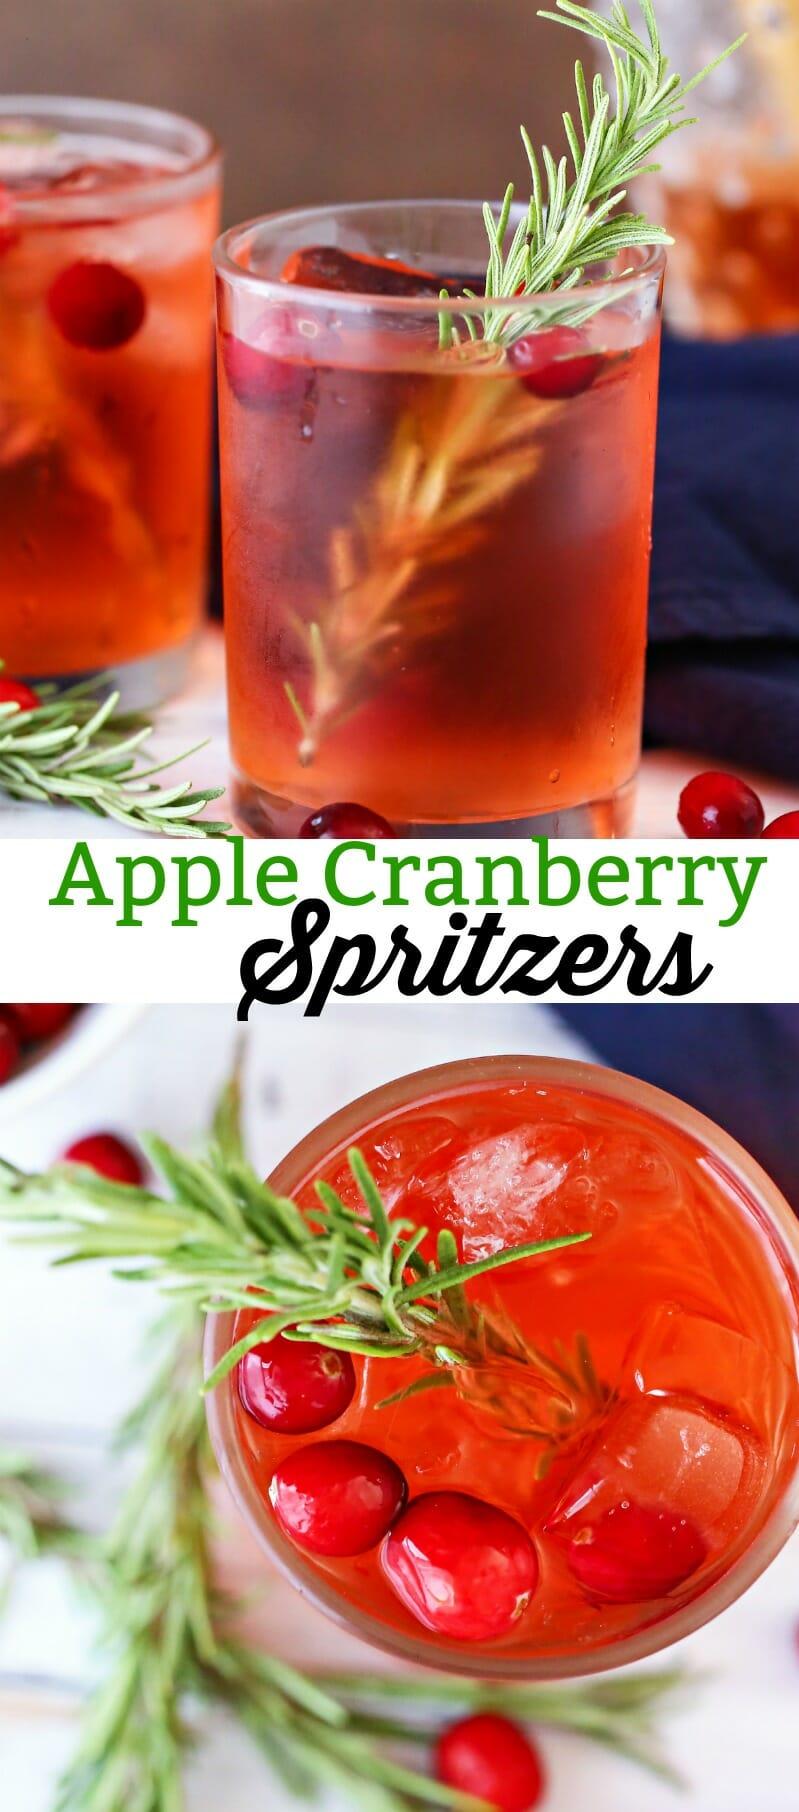 Apple Cranberry Spritzers